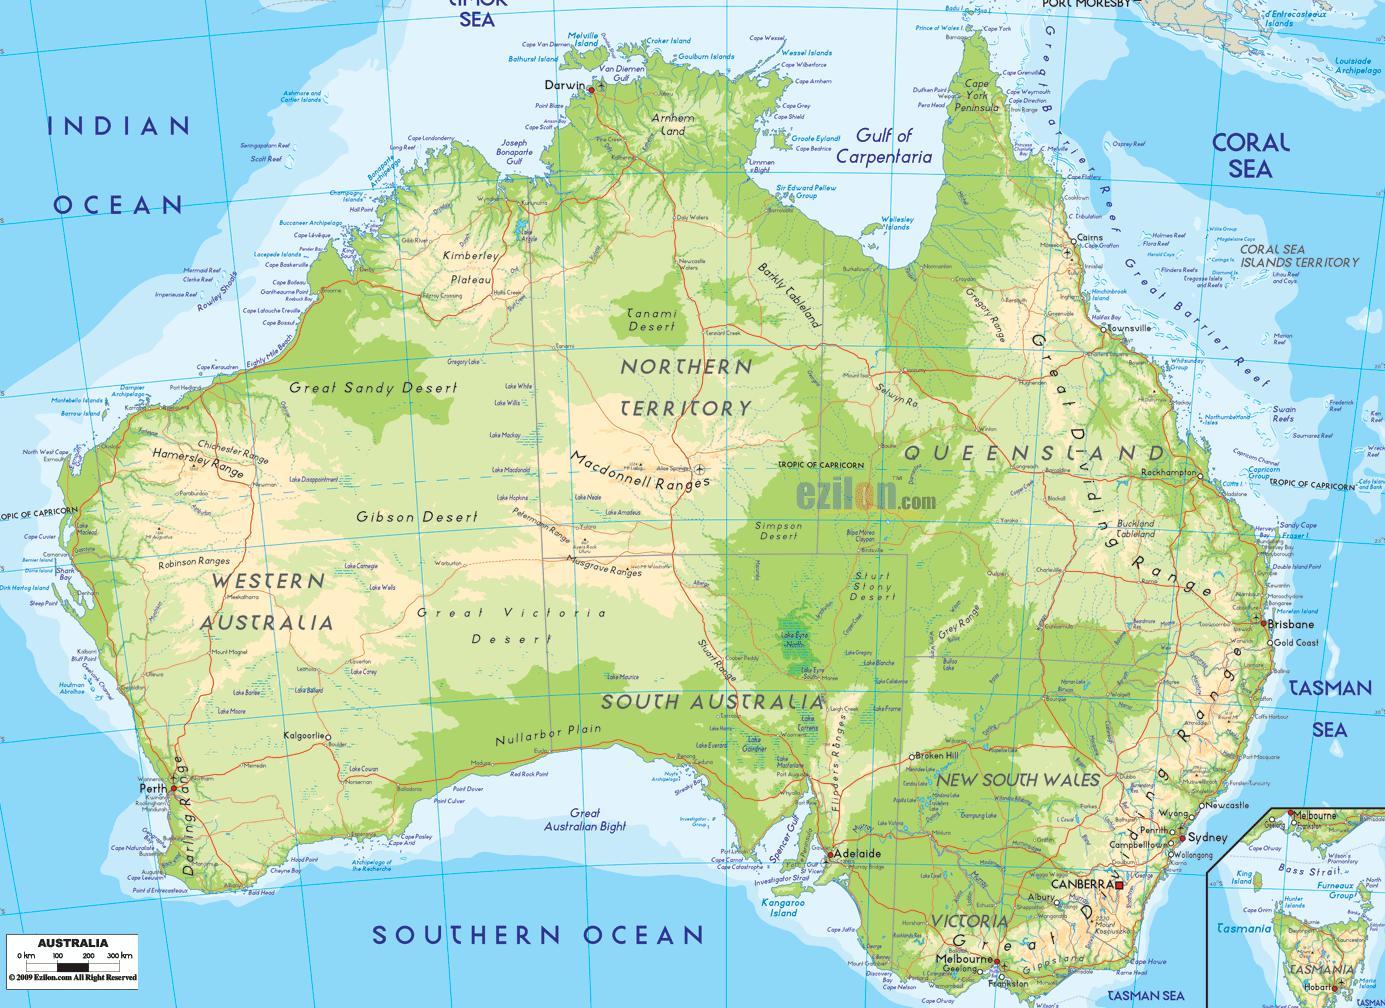 Cartina Geografica Australia E Nuova Zelanda.Australia Cartina Geografica Cartina Geografica Dell Australia